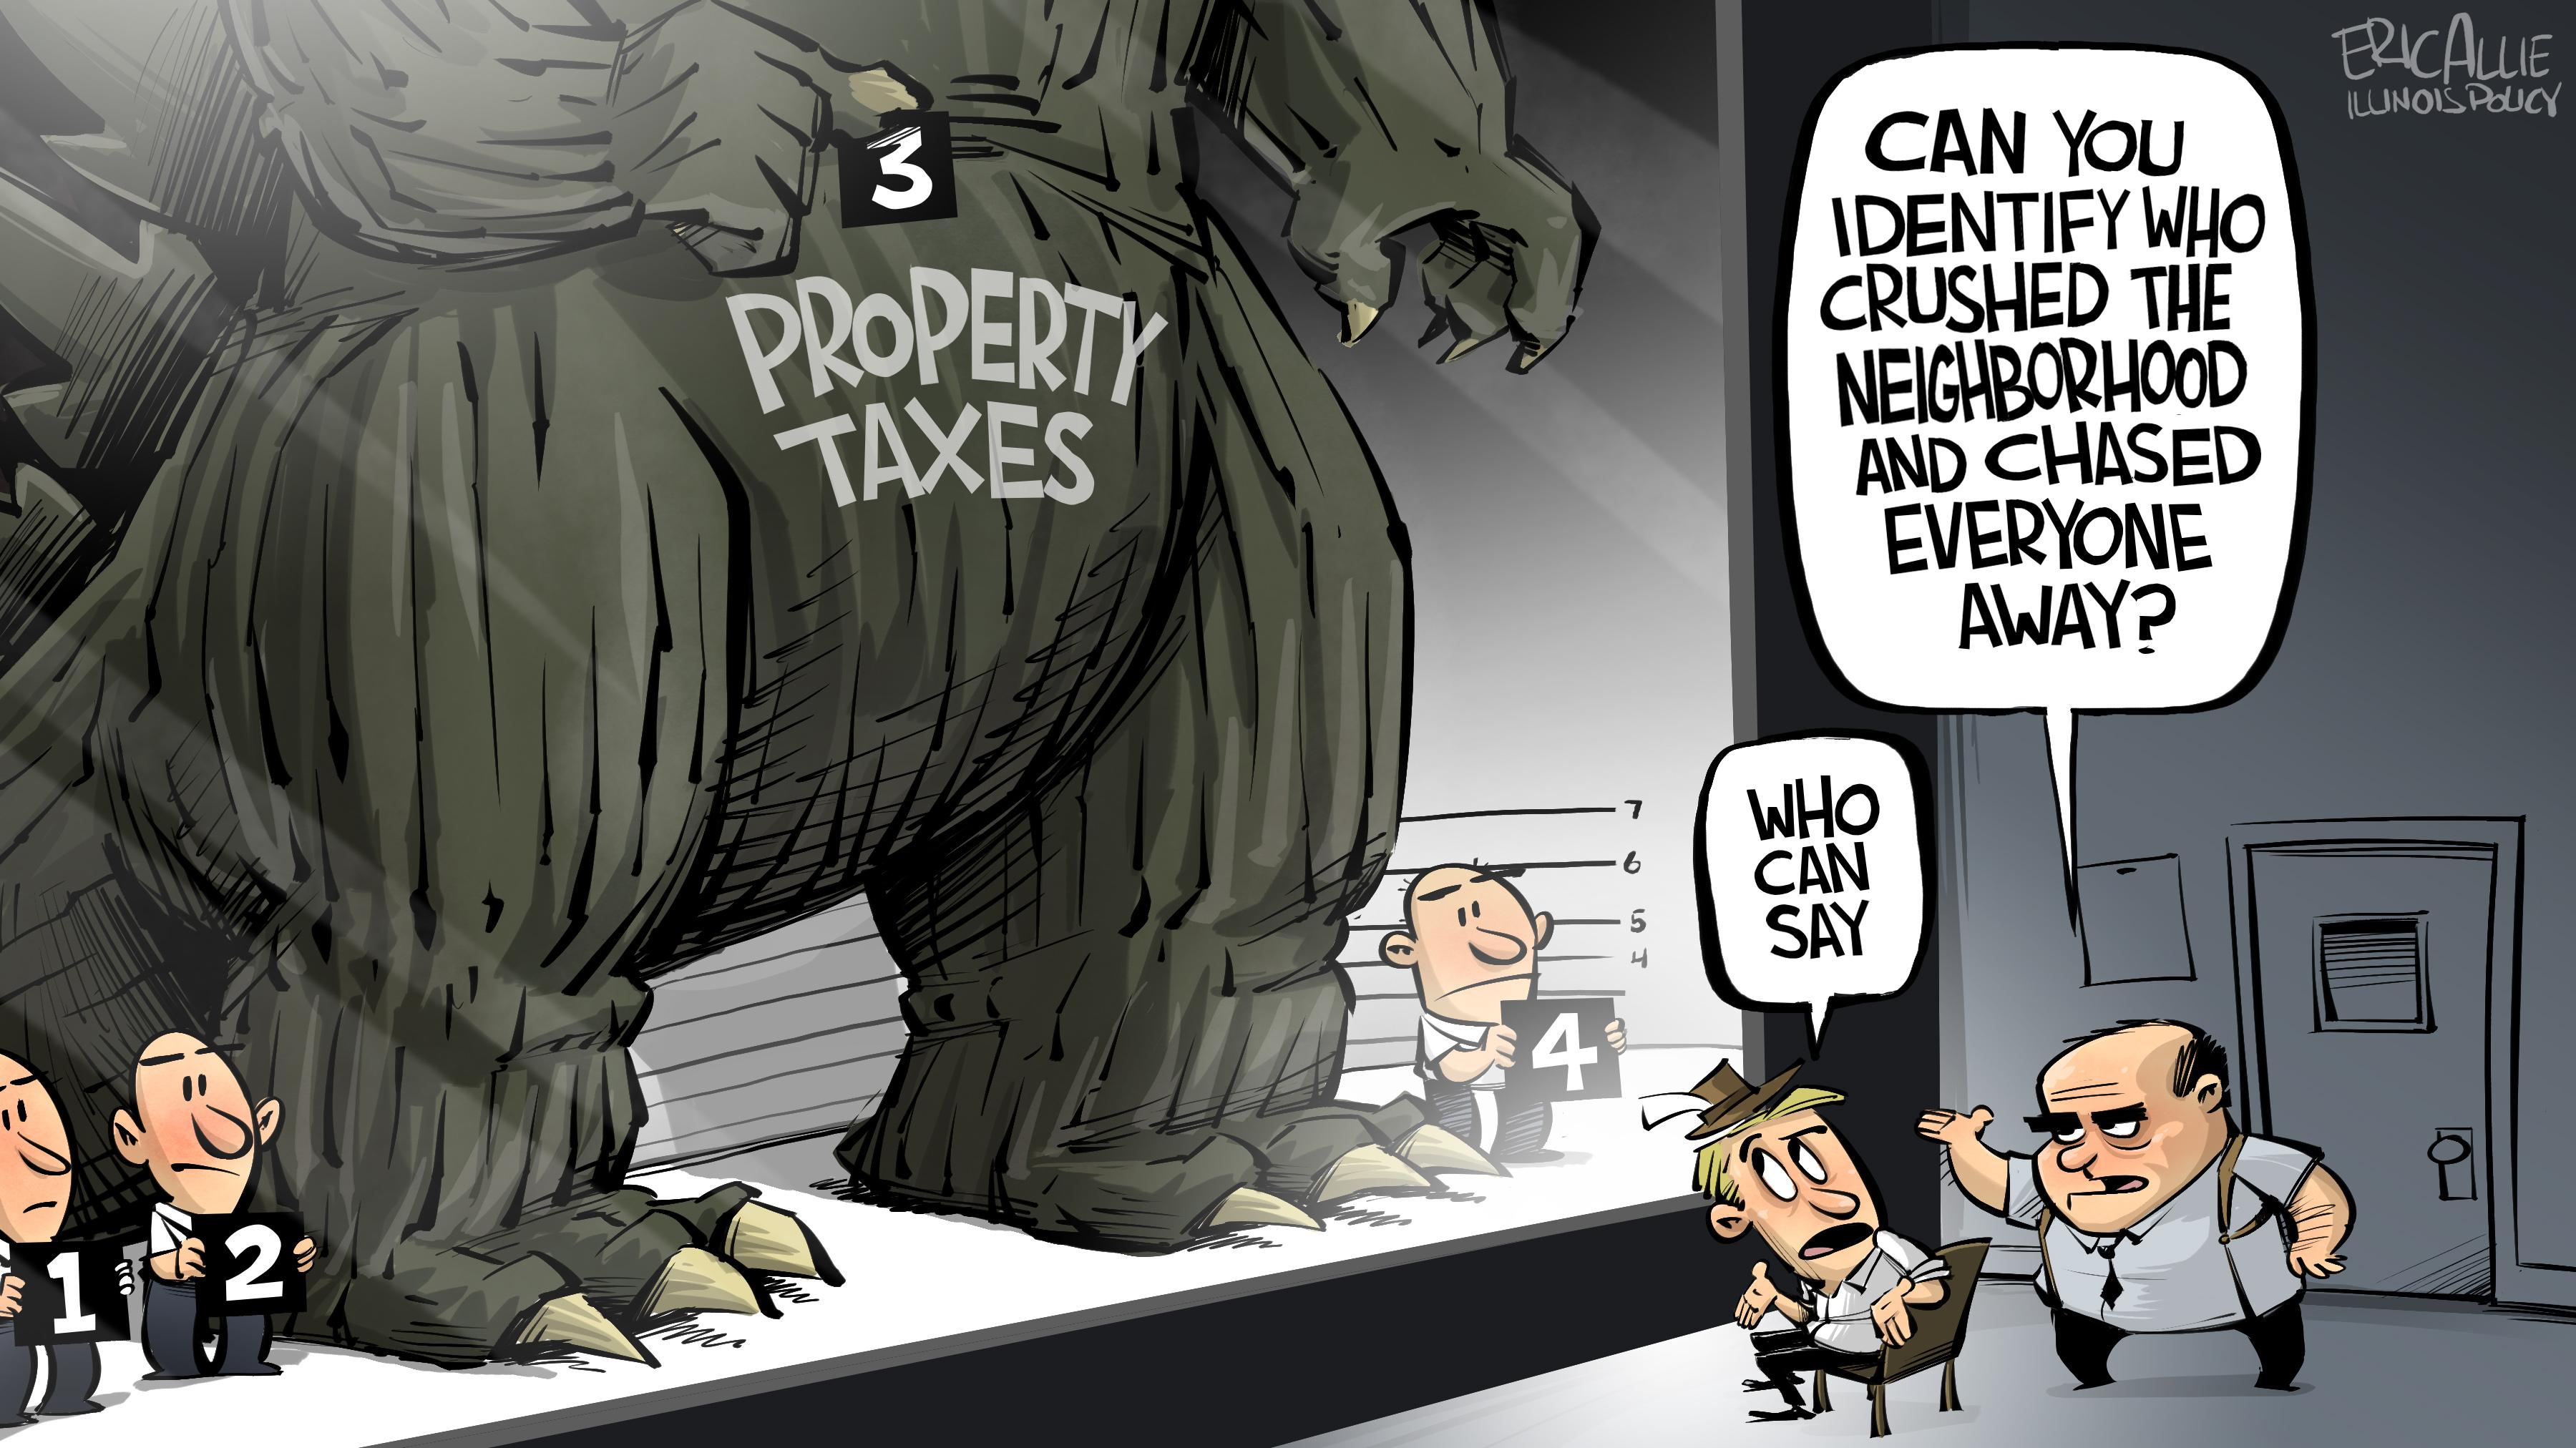 Godzilla property taxes